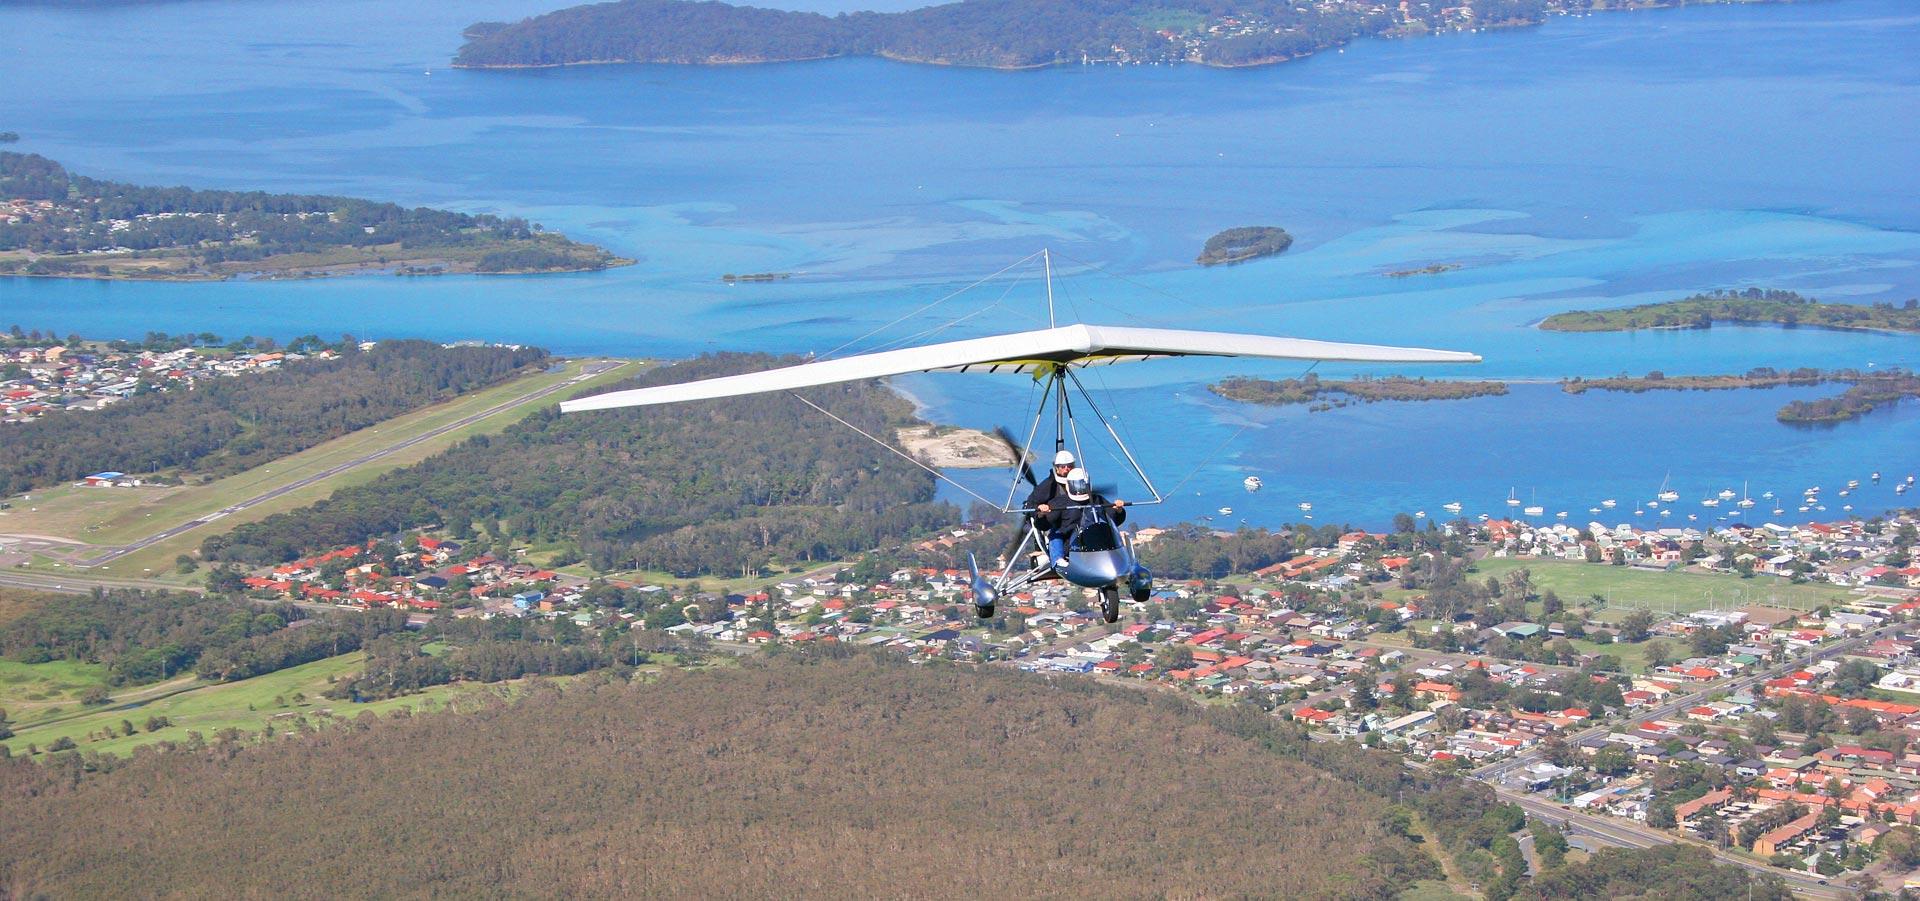 Airborne Flight Training